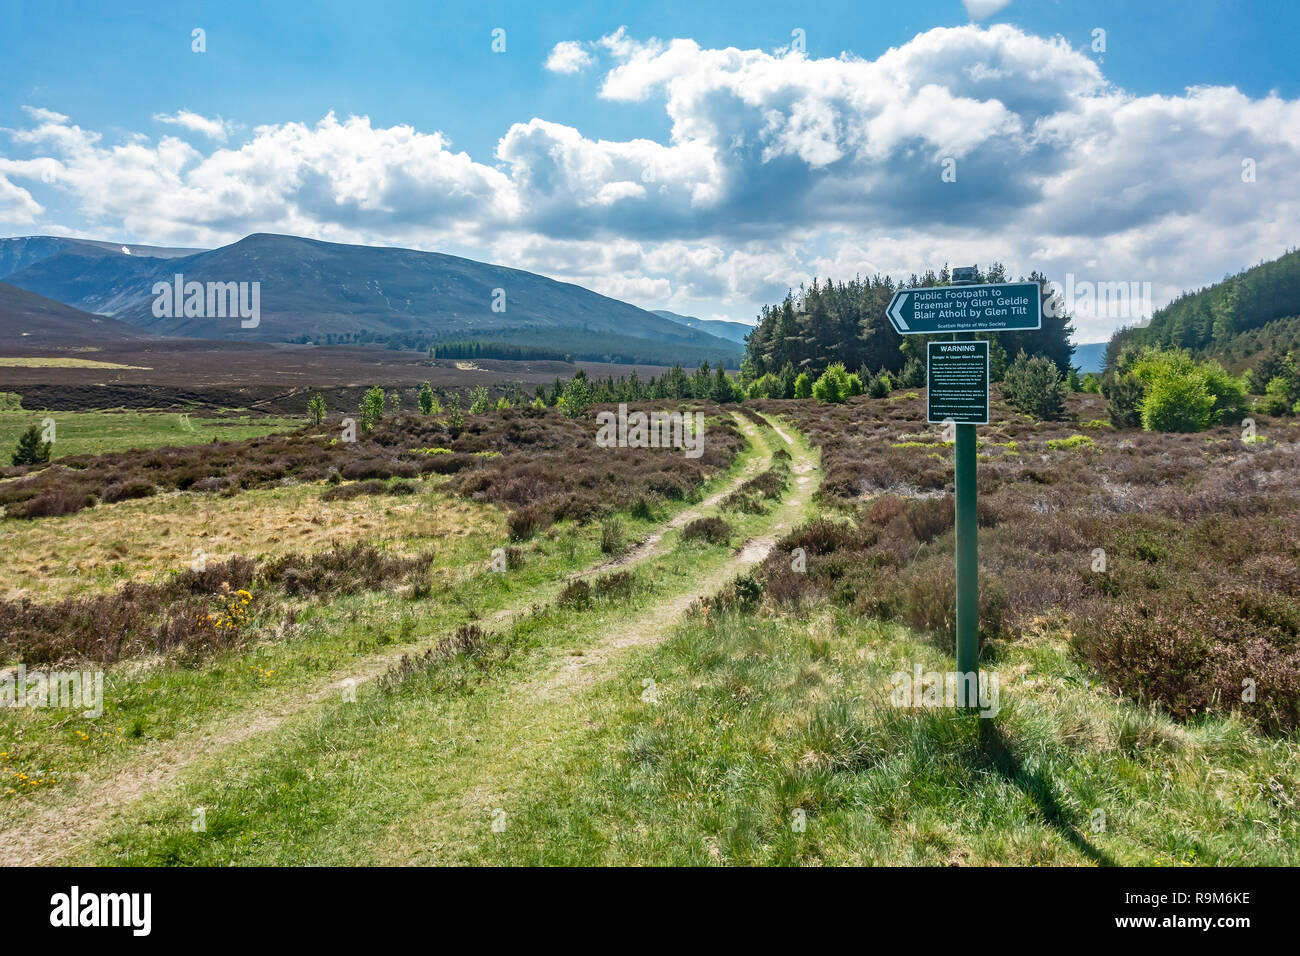 Scottish Rights of Way Society sign in Glen Feshie near Feshiebridge Highland Scotland indicating public footpaths to Braemar & Blair Atholl - Stock Image